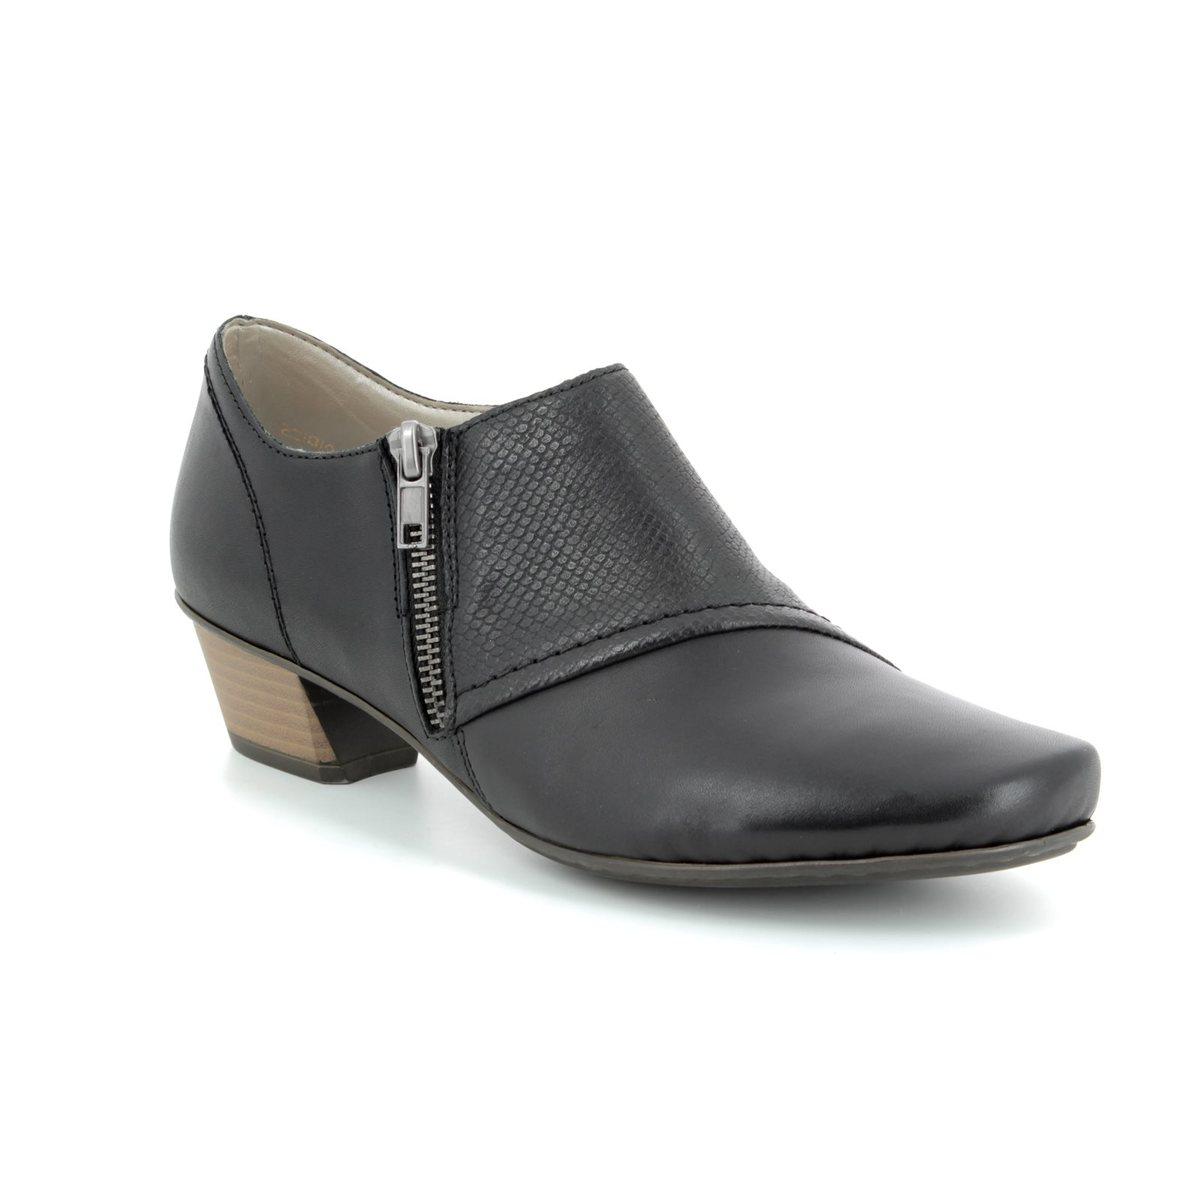 01d0167c3e Rieker Shoe-boots - Black - 53861-00 MIROTTI